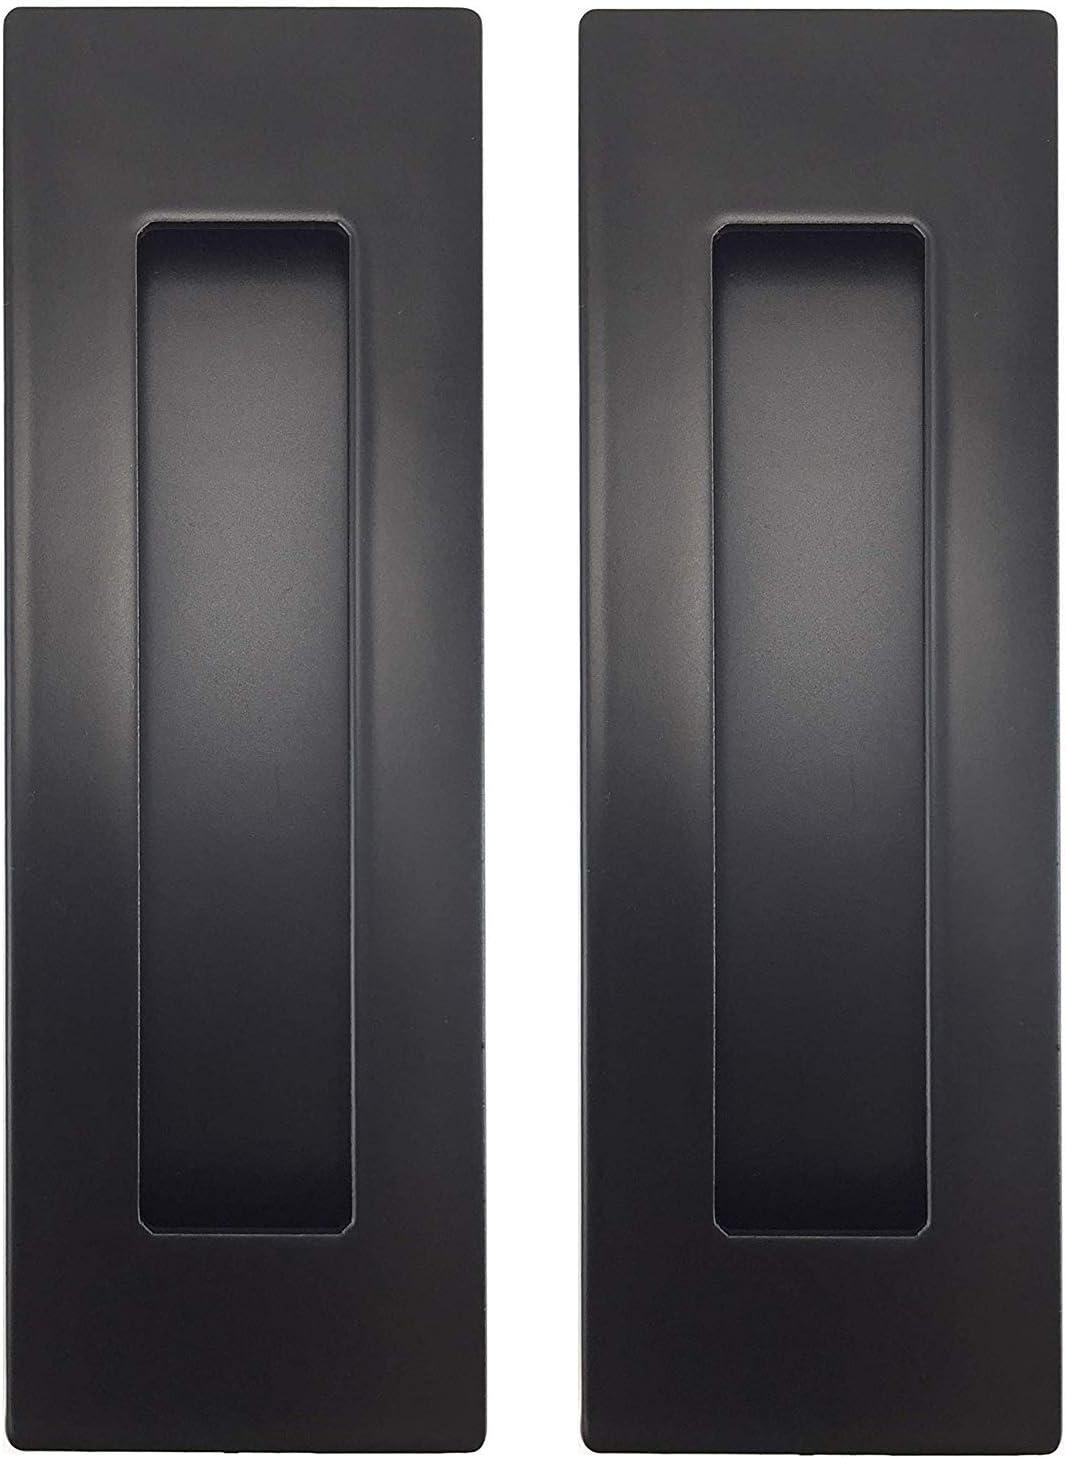 "Flush Pull Barn Door Handle (2 Pack) 6"" Black   No Sharp Edge   Screws Included (Black)"